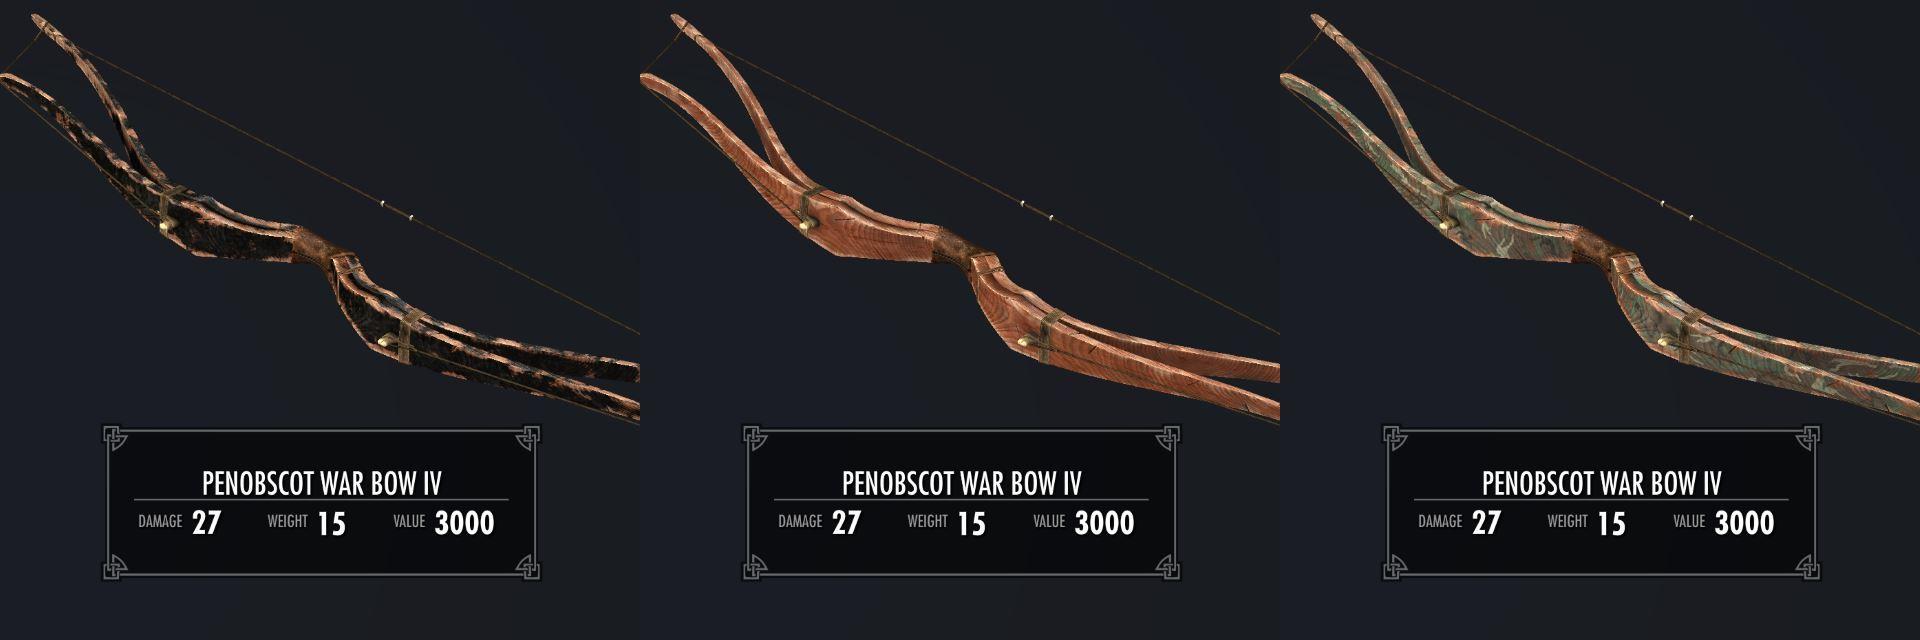 PenobscotWarBowSK 015-1 Info Bow4 CamoPaint 2